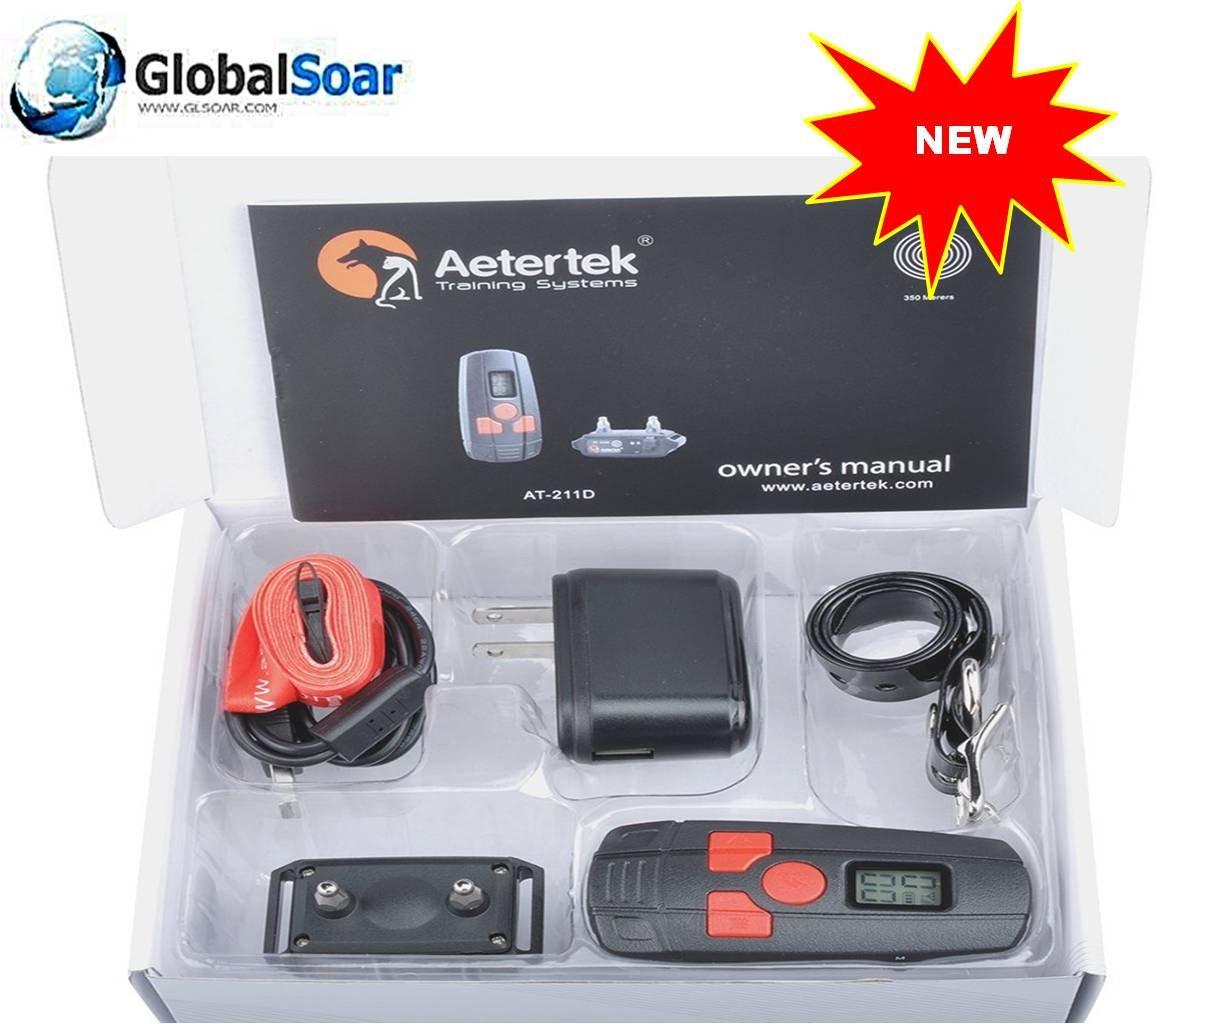 Aetertek 211D-350W-1 400 Yard small Dog (3 ~ 12 lbs) Training Anti Bark Collar by Aetertek